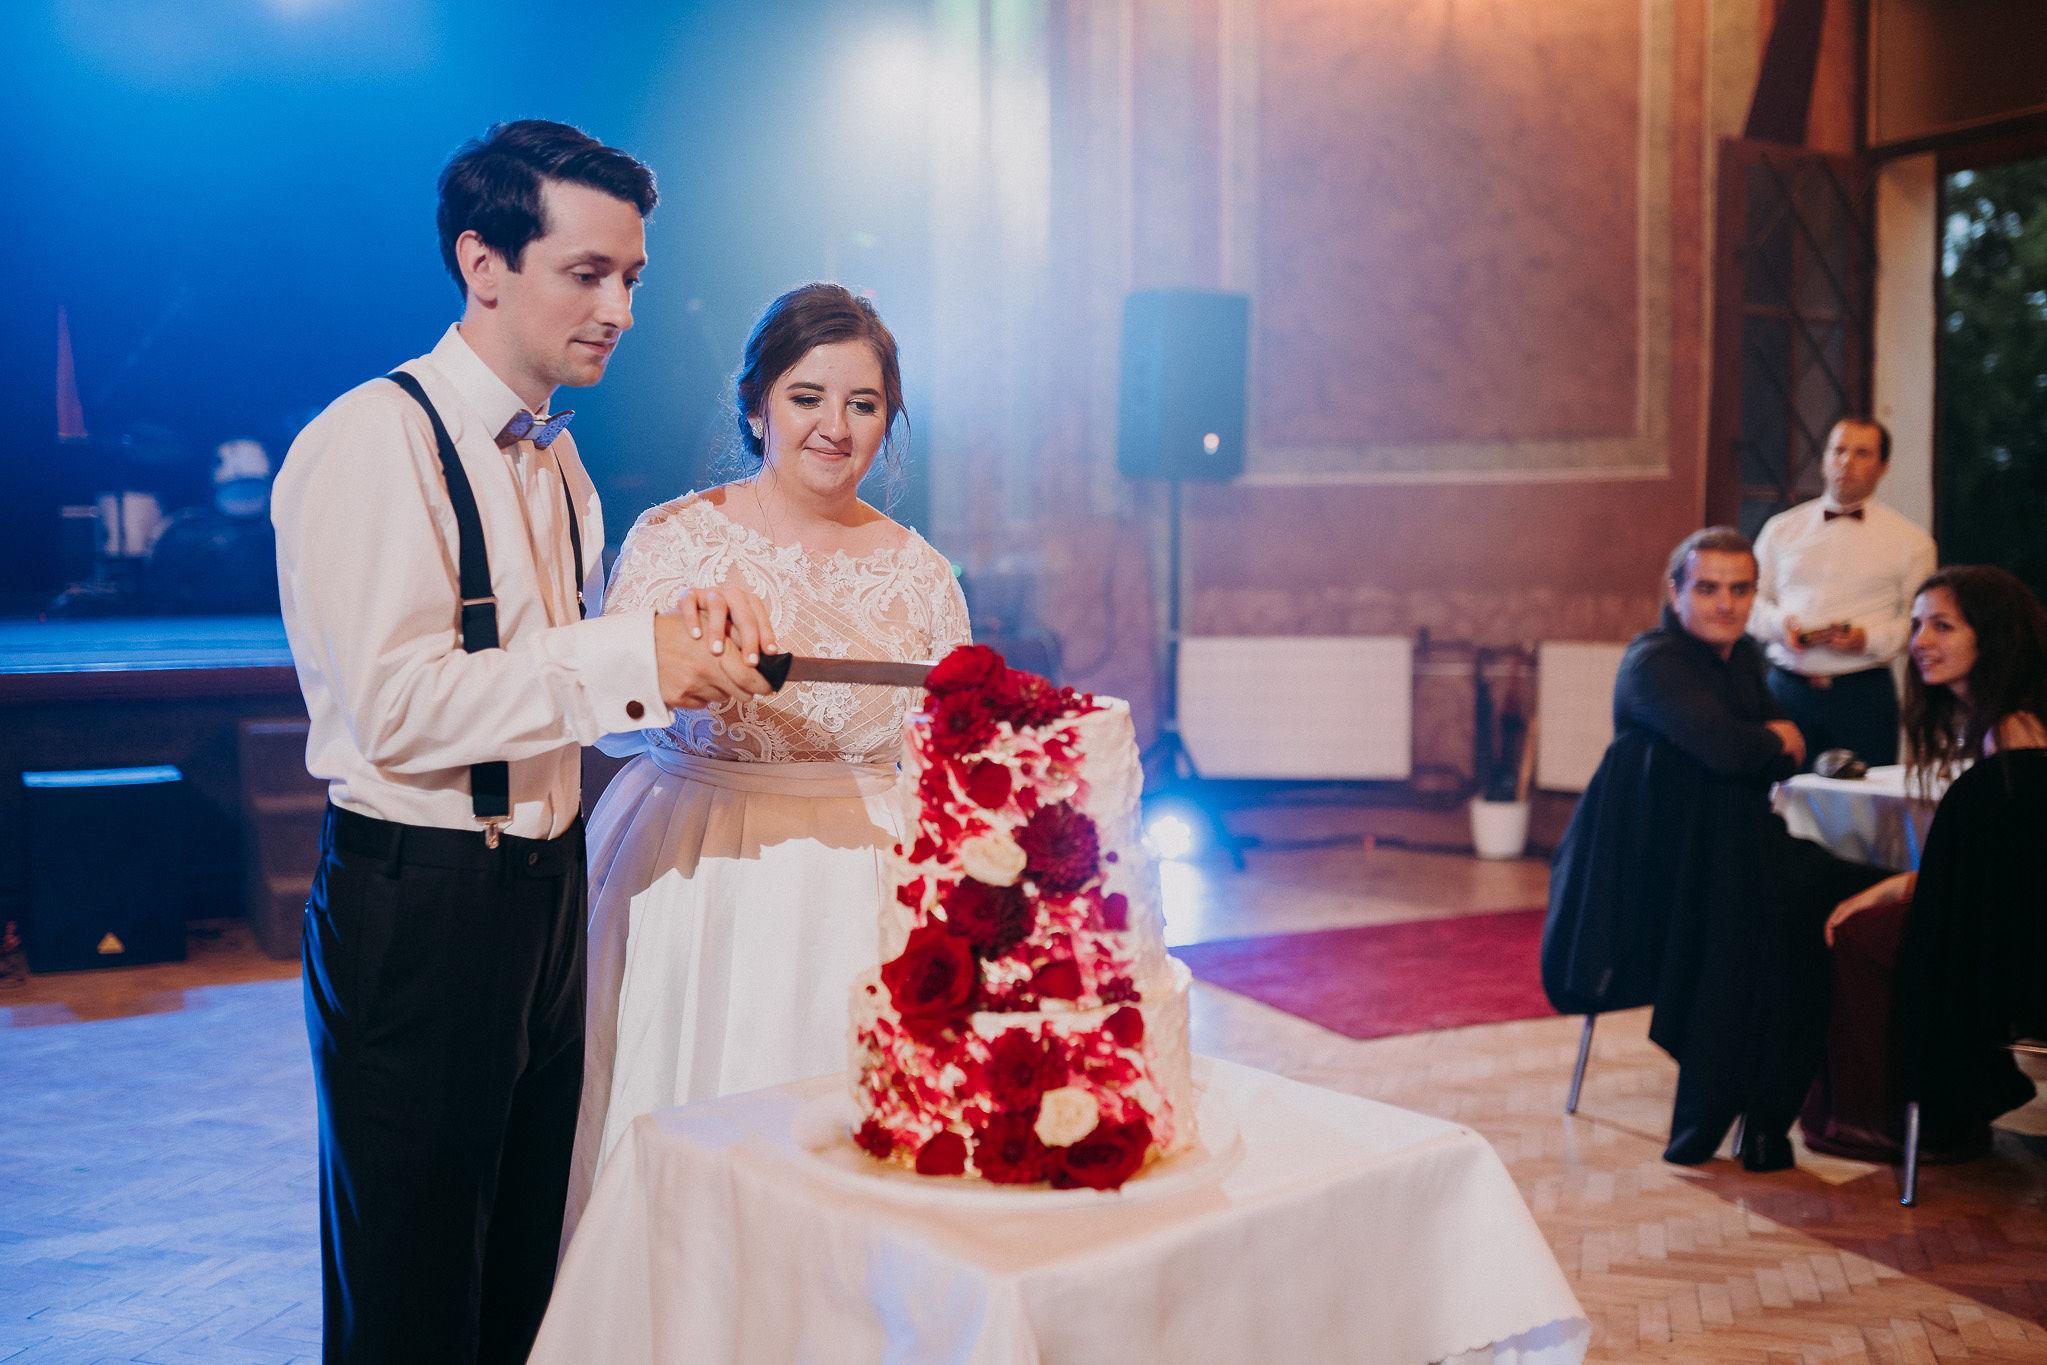 Svadba Hlohovec, Empirove divadlo 02 #svadobnyDJ, #djanasvadbu, #svadba, #svadbahlohovec, #Hlohovec #DJAnavi, #empirovedivadlo